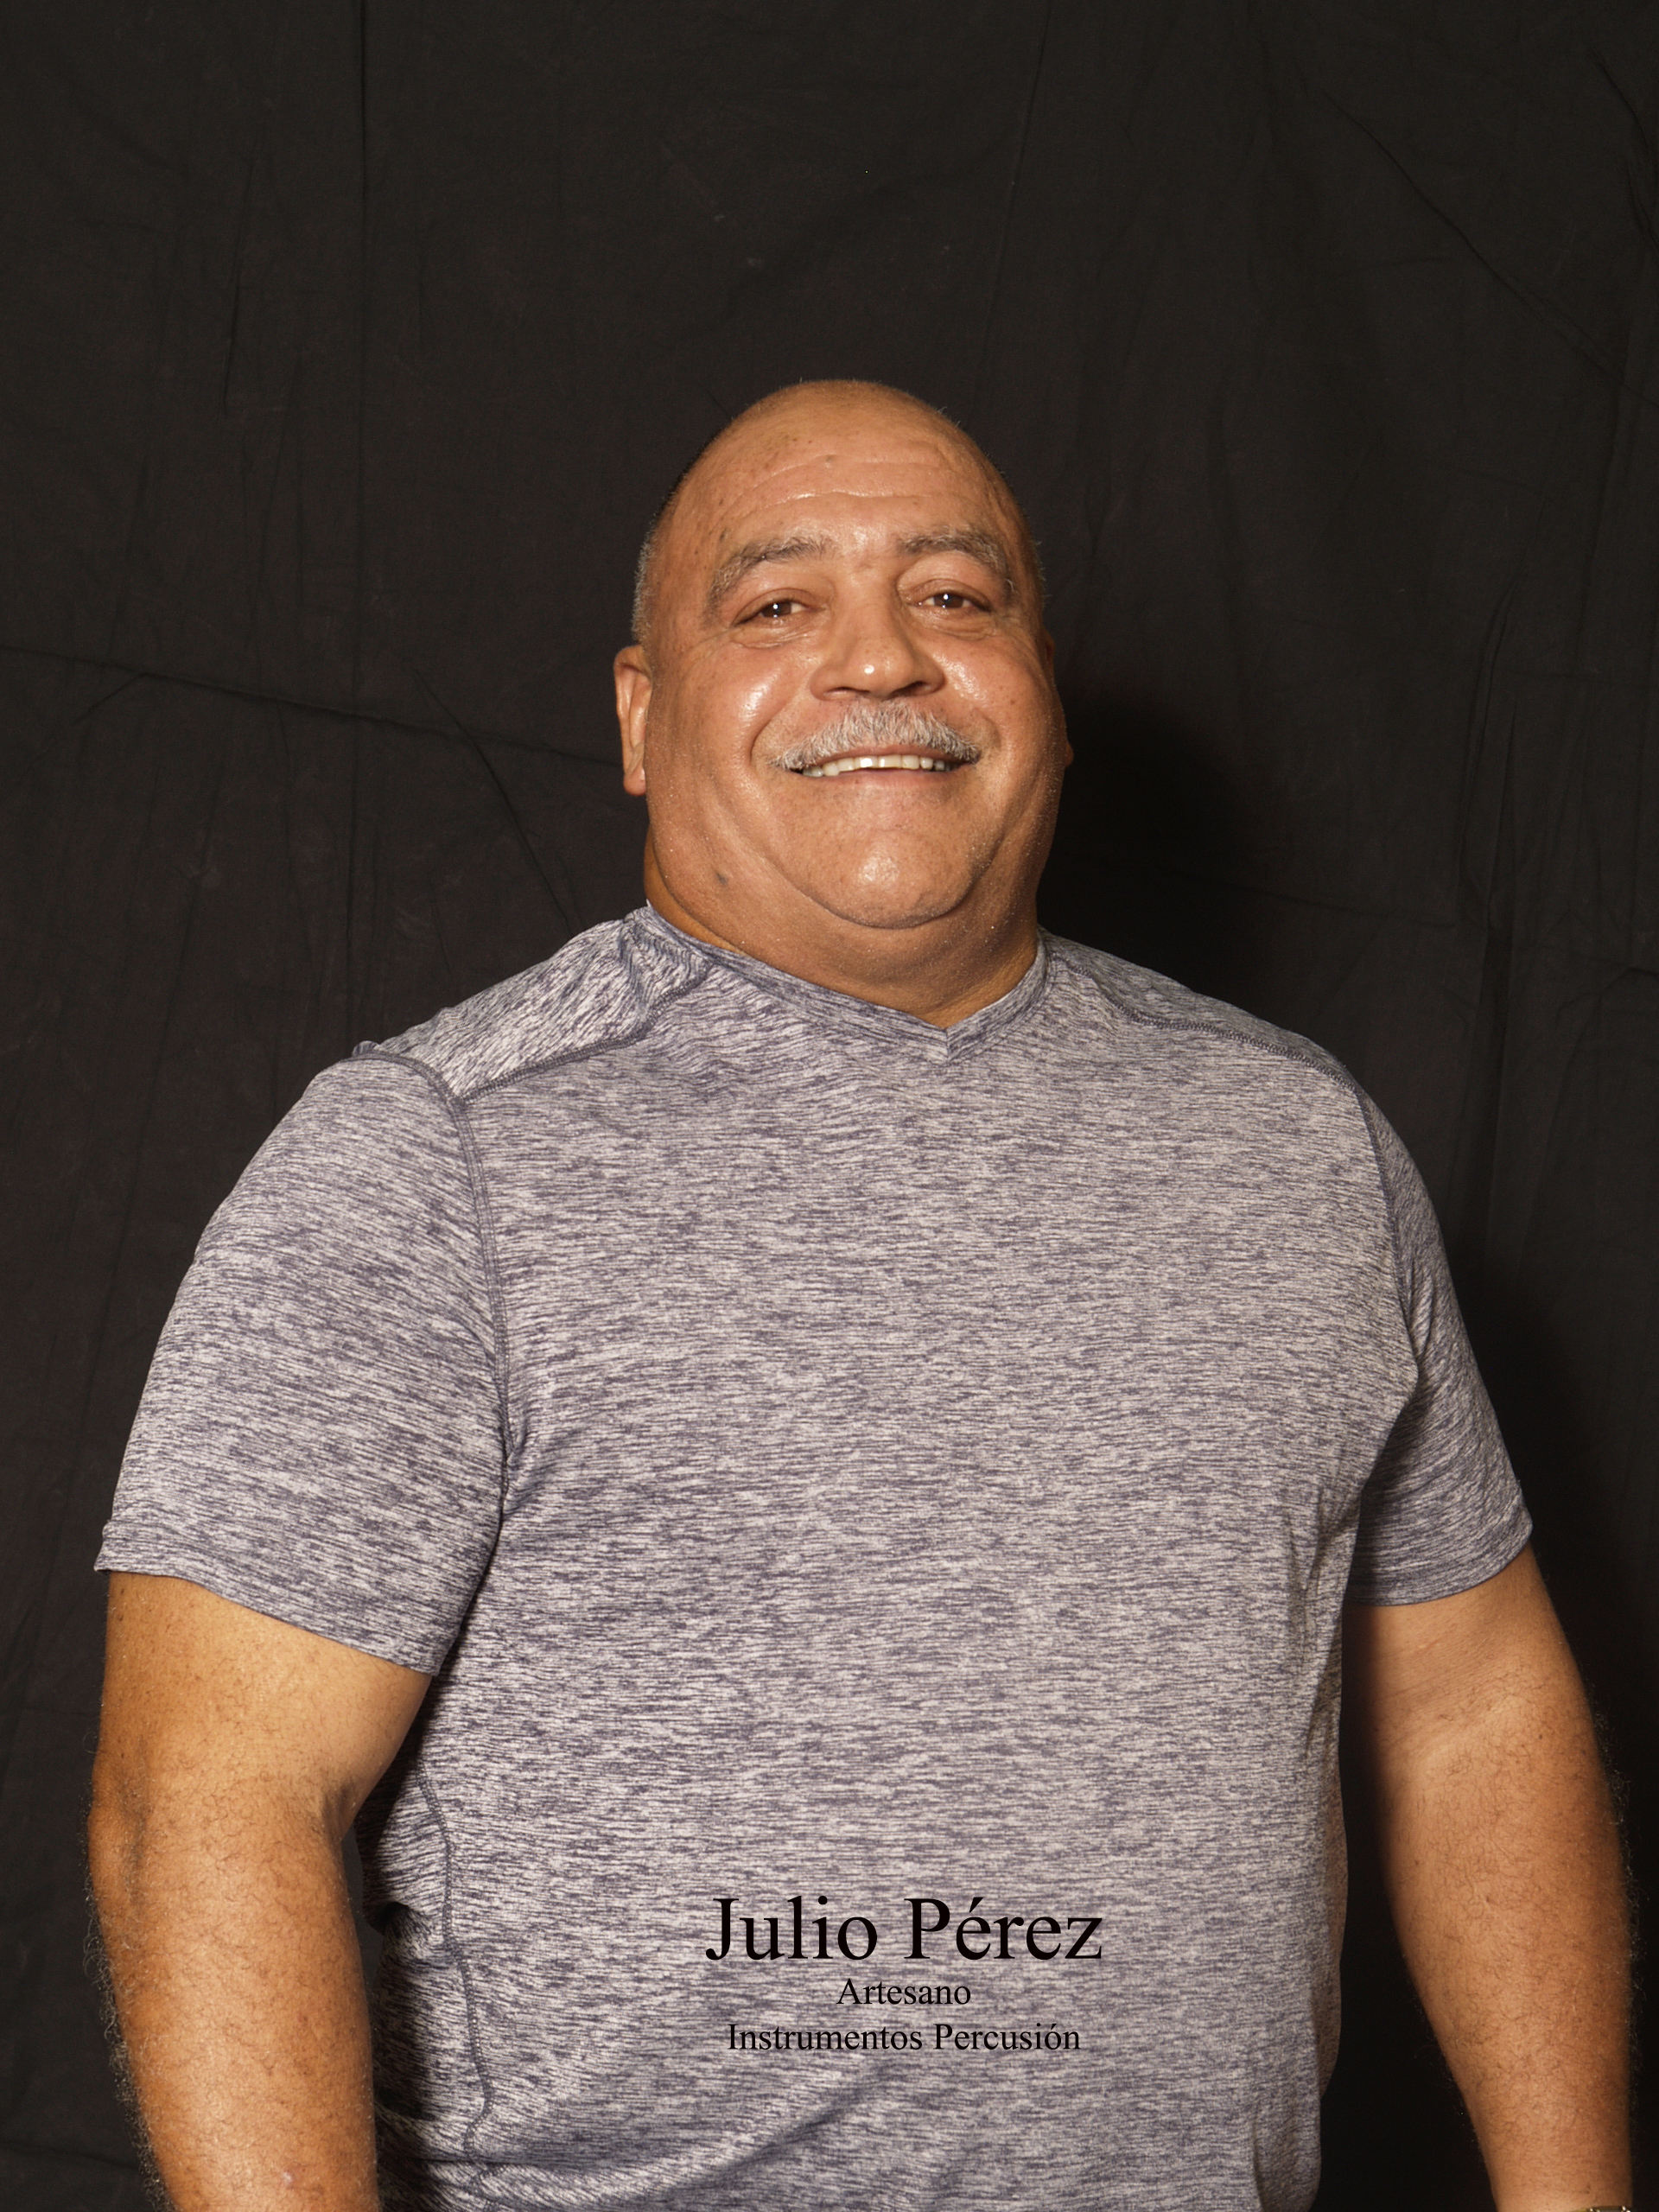 Julio_Pérez_-_Artesano_Instrumento_de_Percusión